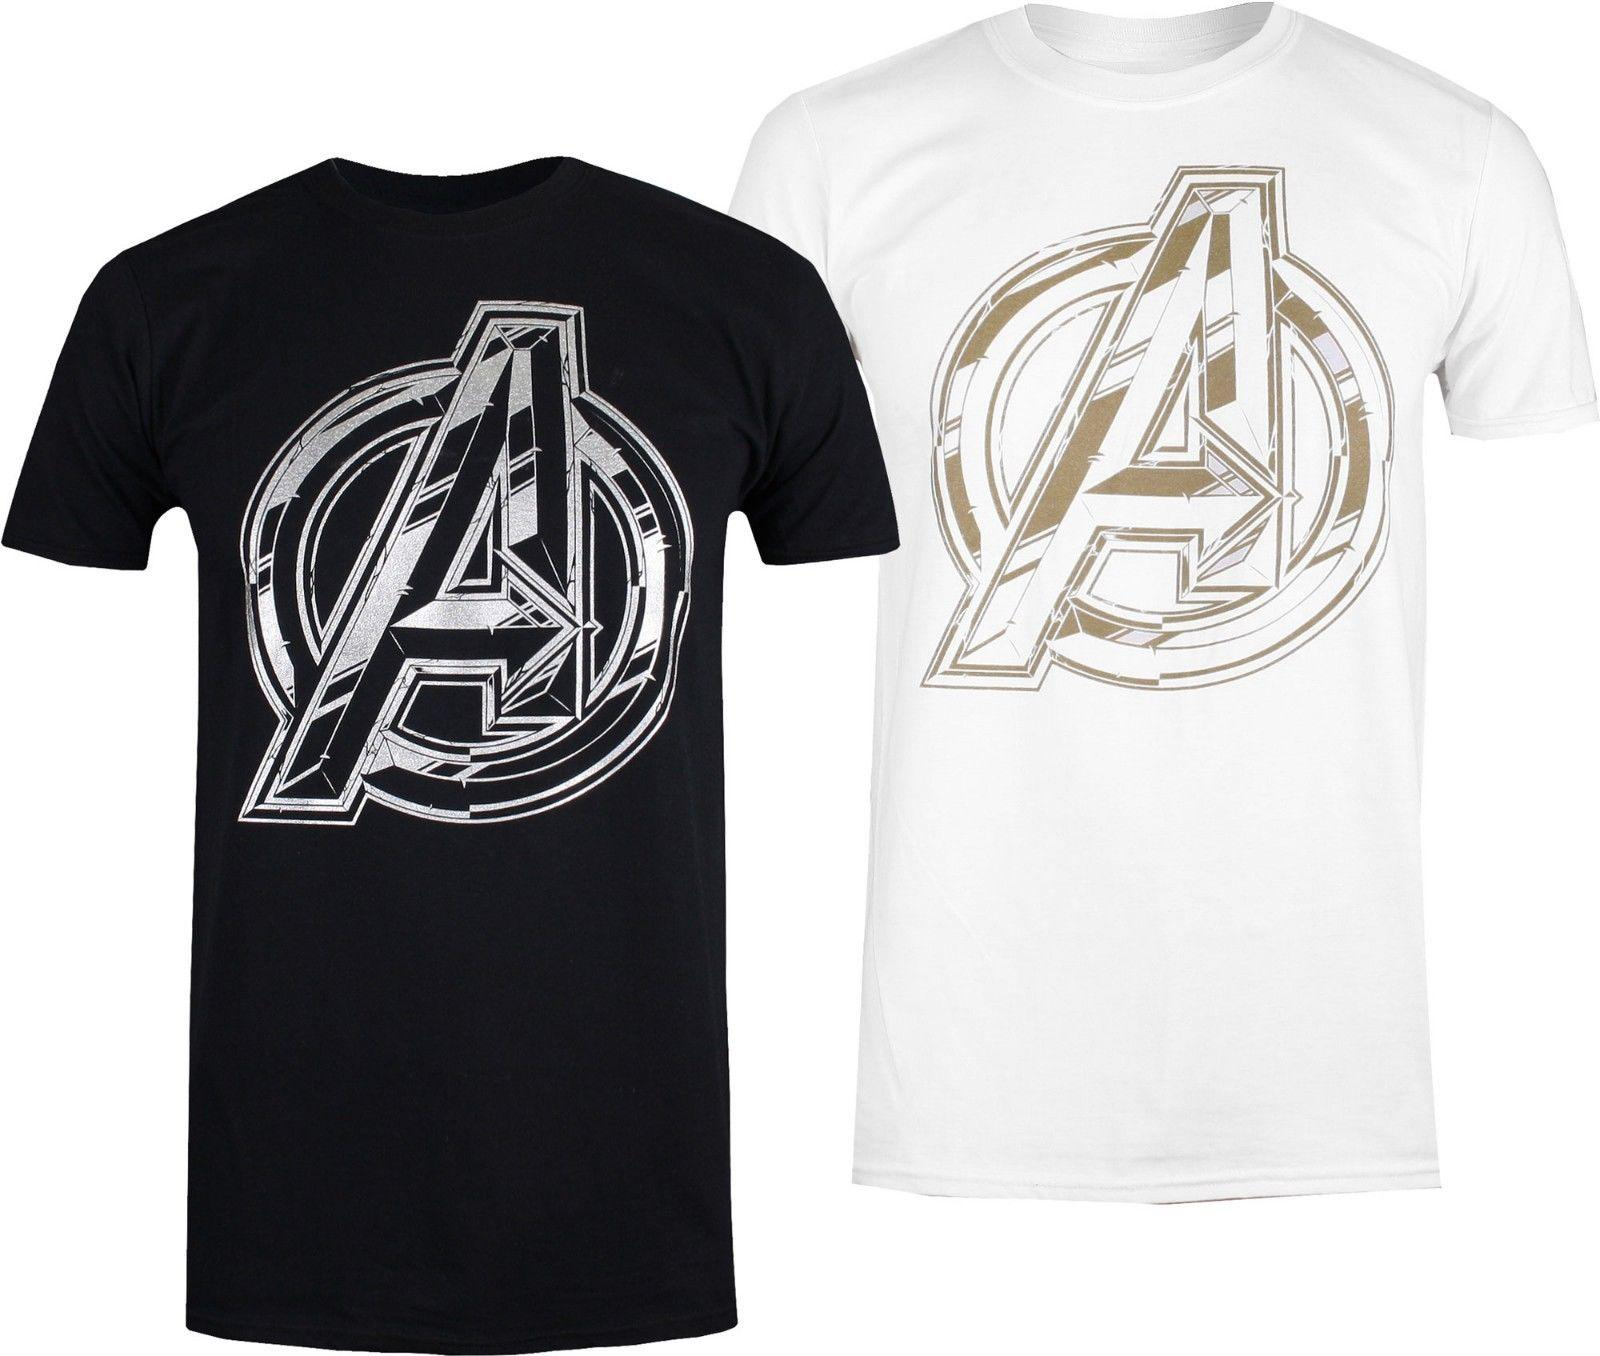 d48f4038631 Compre Logotipo De Marvel Avengers Infinity War Camiseta Para Hombre Negro  O Blanco Tallas S XXL Divertido Envío Gratis Camiseta Casual Unisex A  $12.96 Del ...